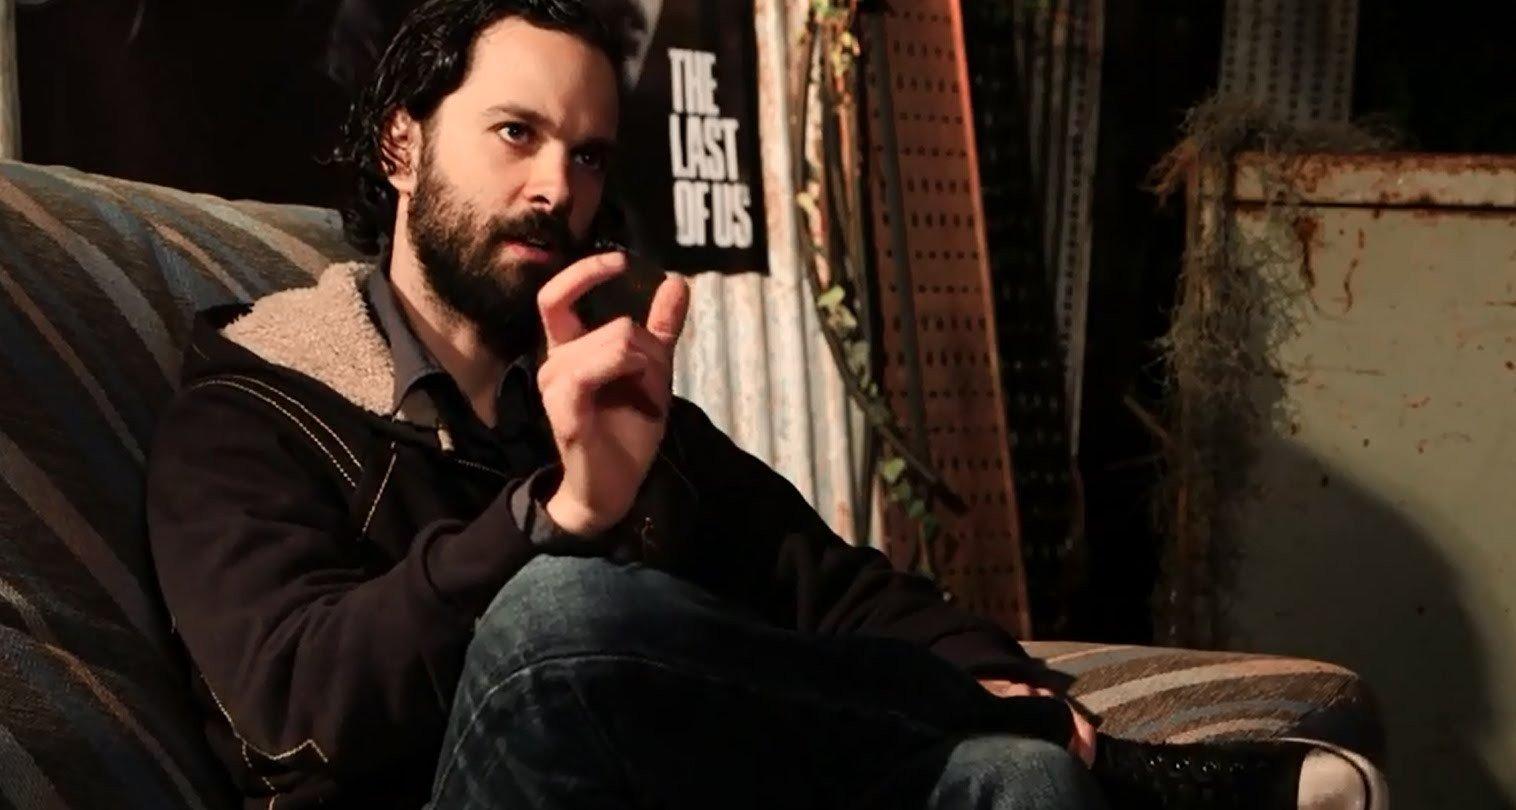 Neil Druckmann, de Naughty Dog, habla sobre su próximo proyecto